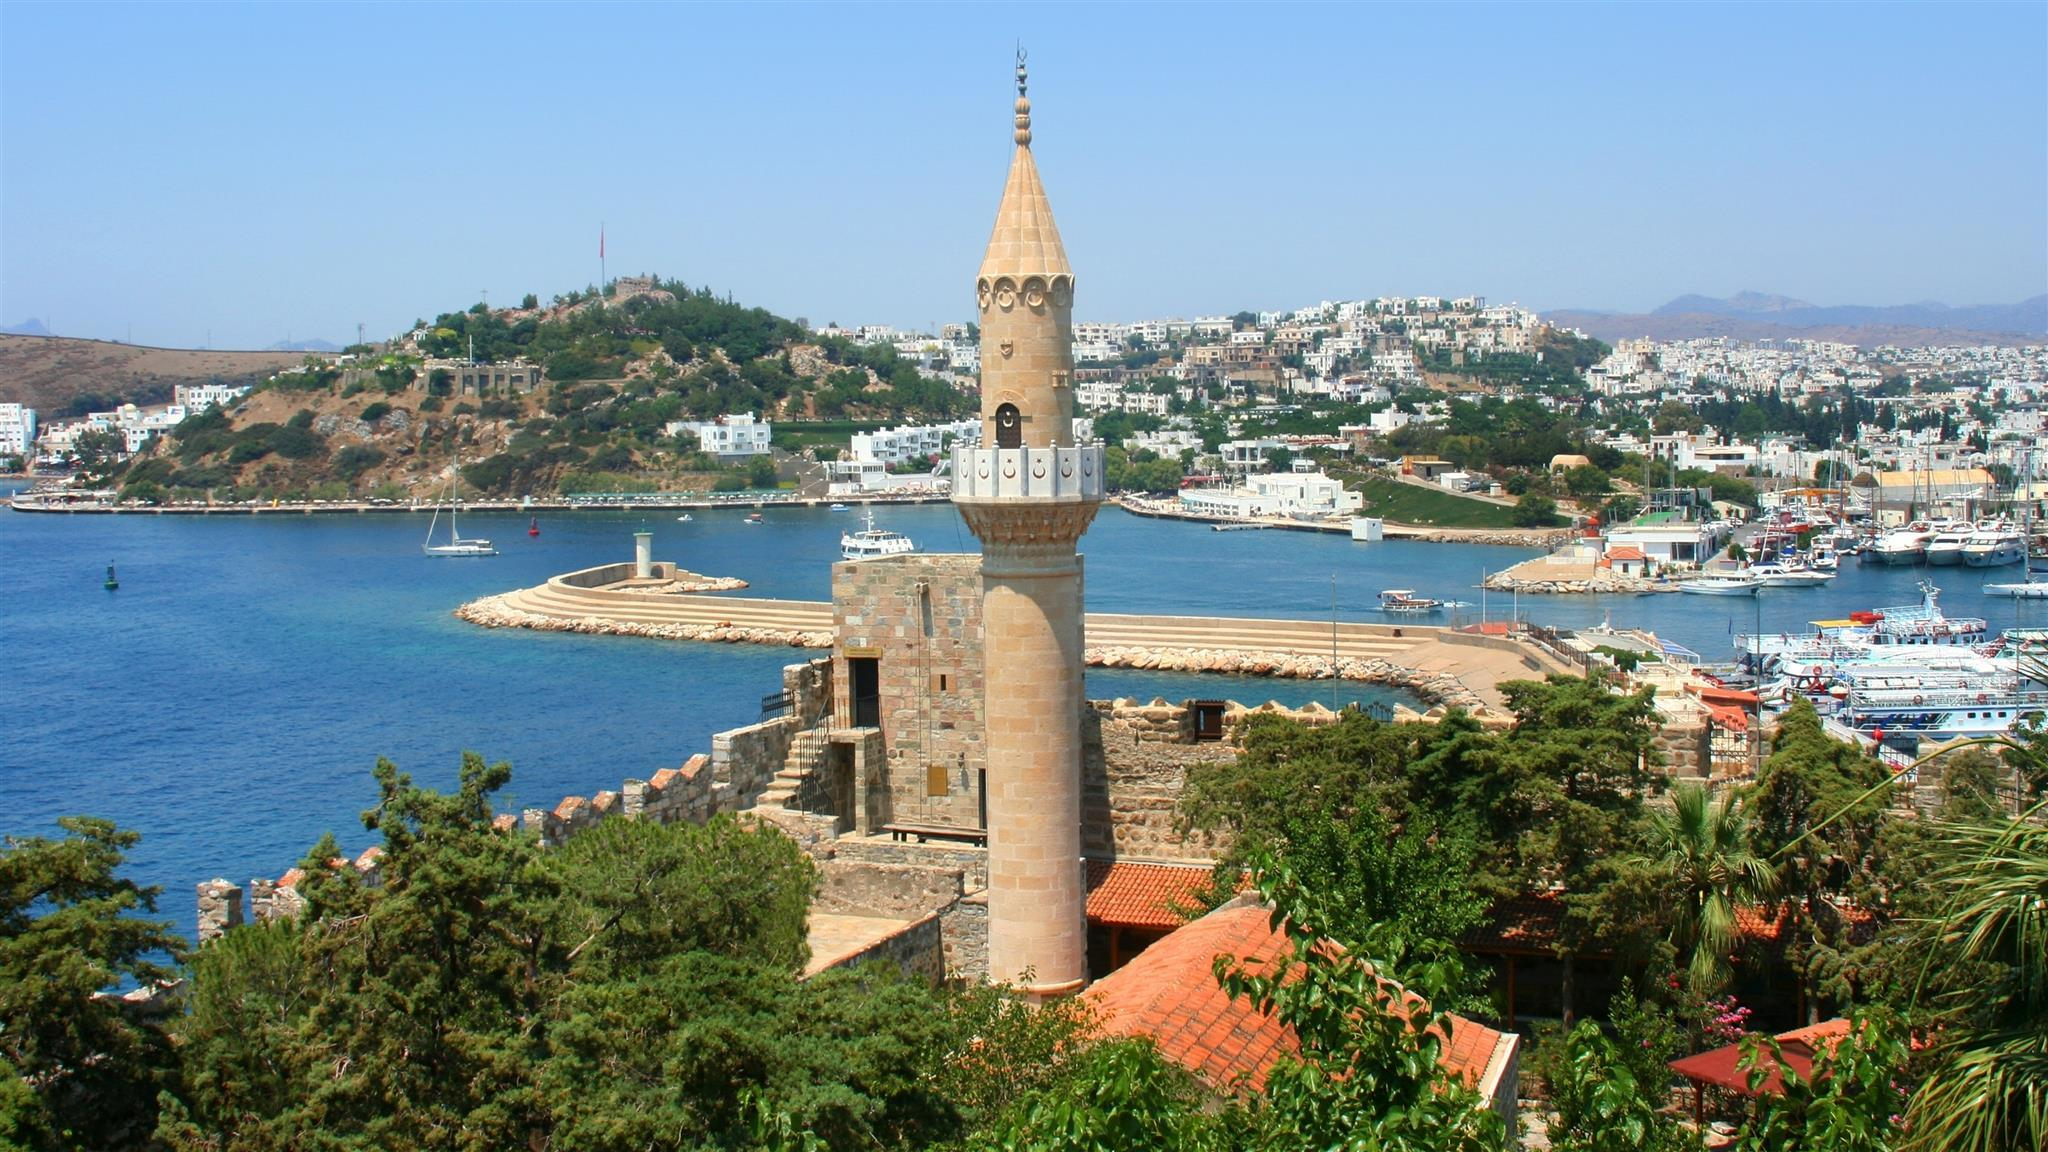 10 best bodrum hotels hd photos reviews of hotels in bodrum turkey rh agoda com